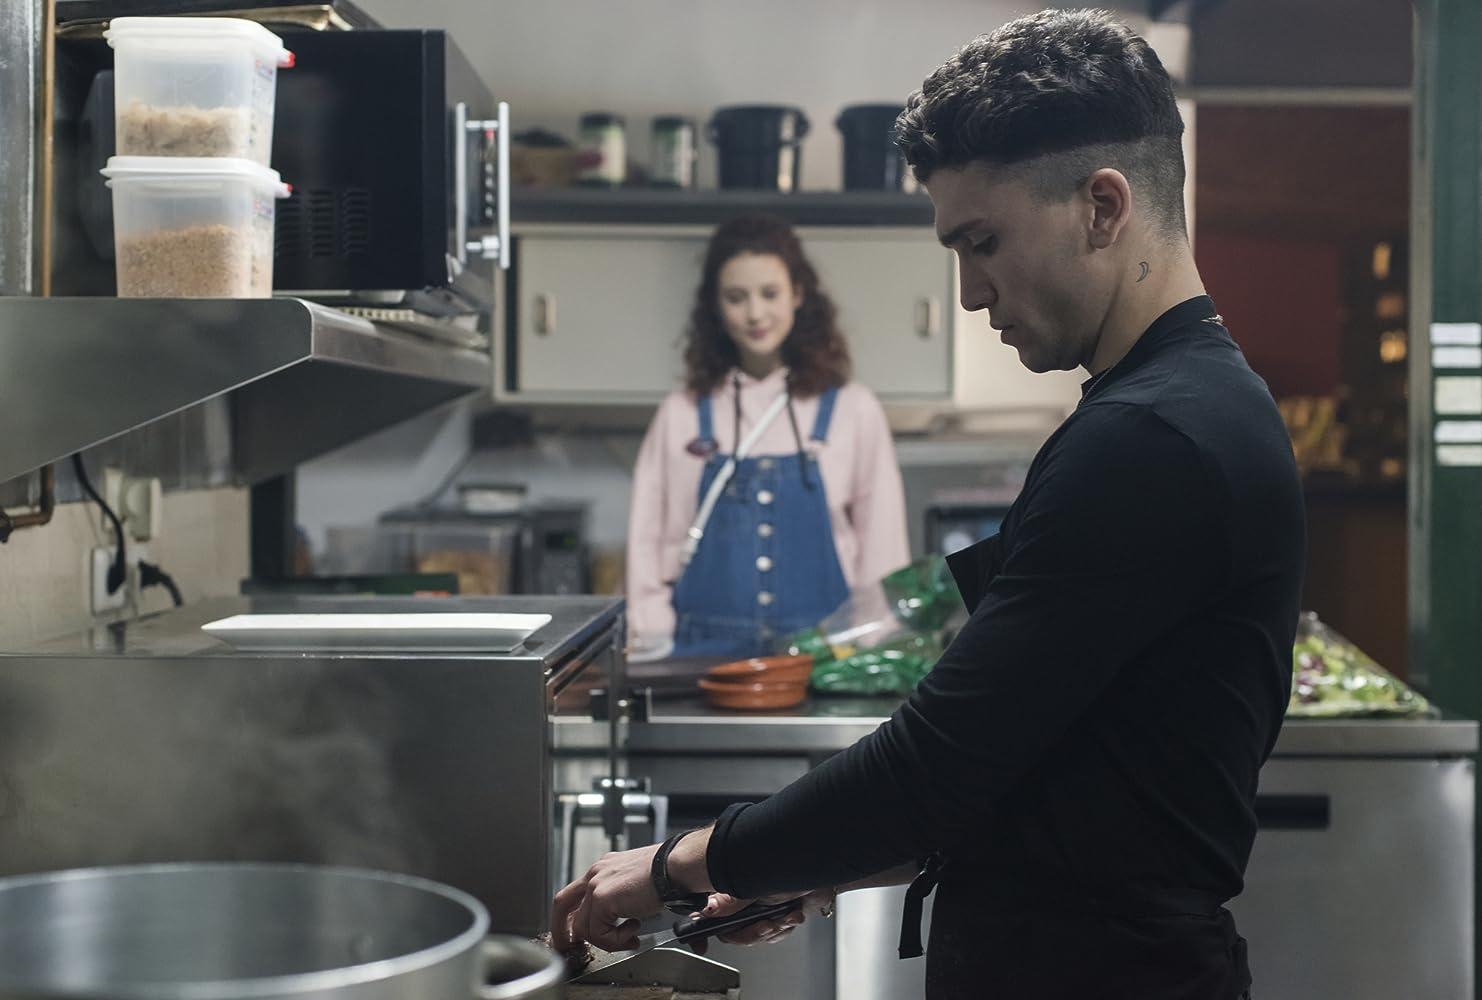 Jaime Lorente and Maria Pedraza personagens elite netflix (2018)